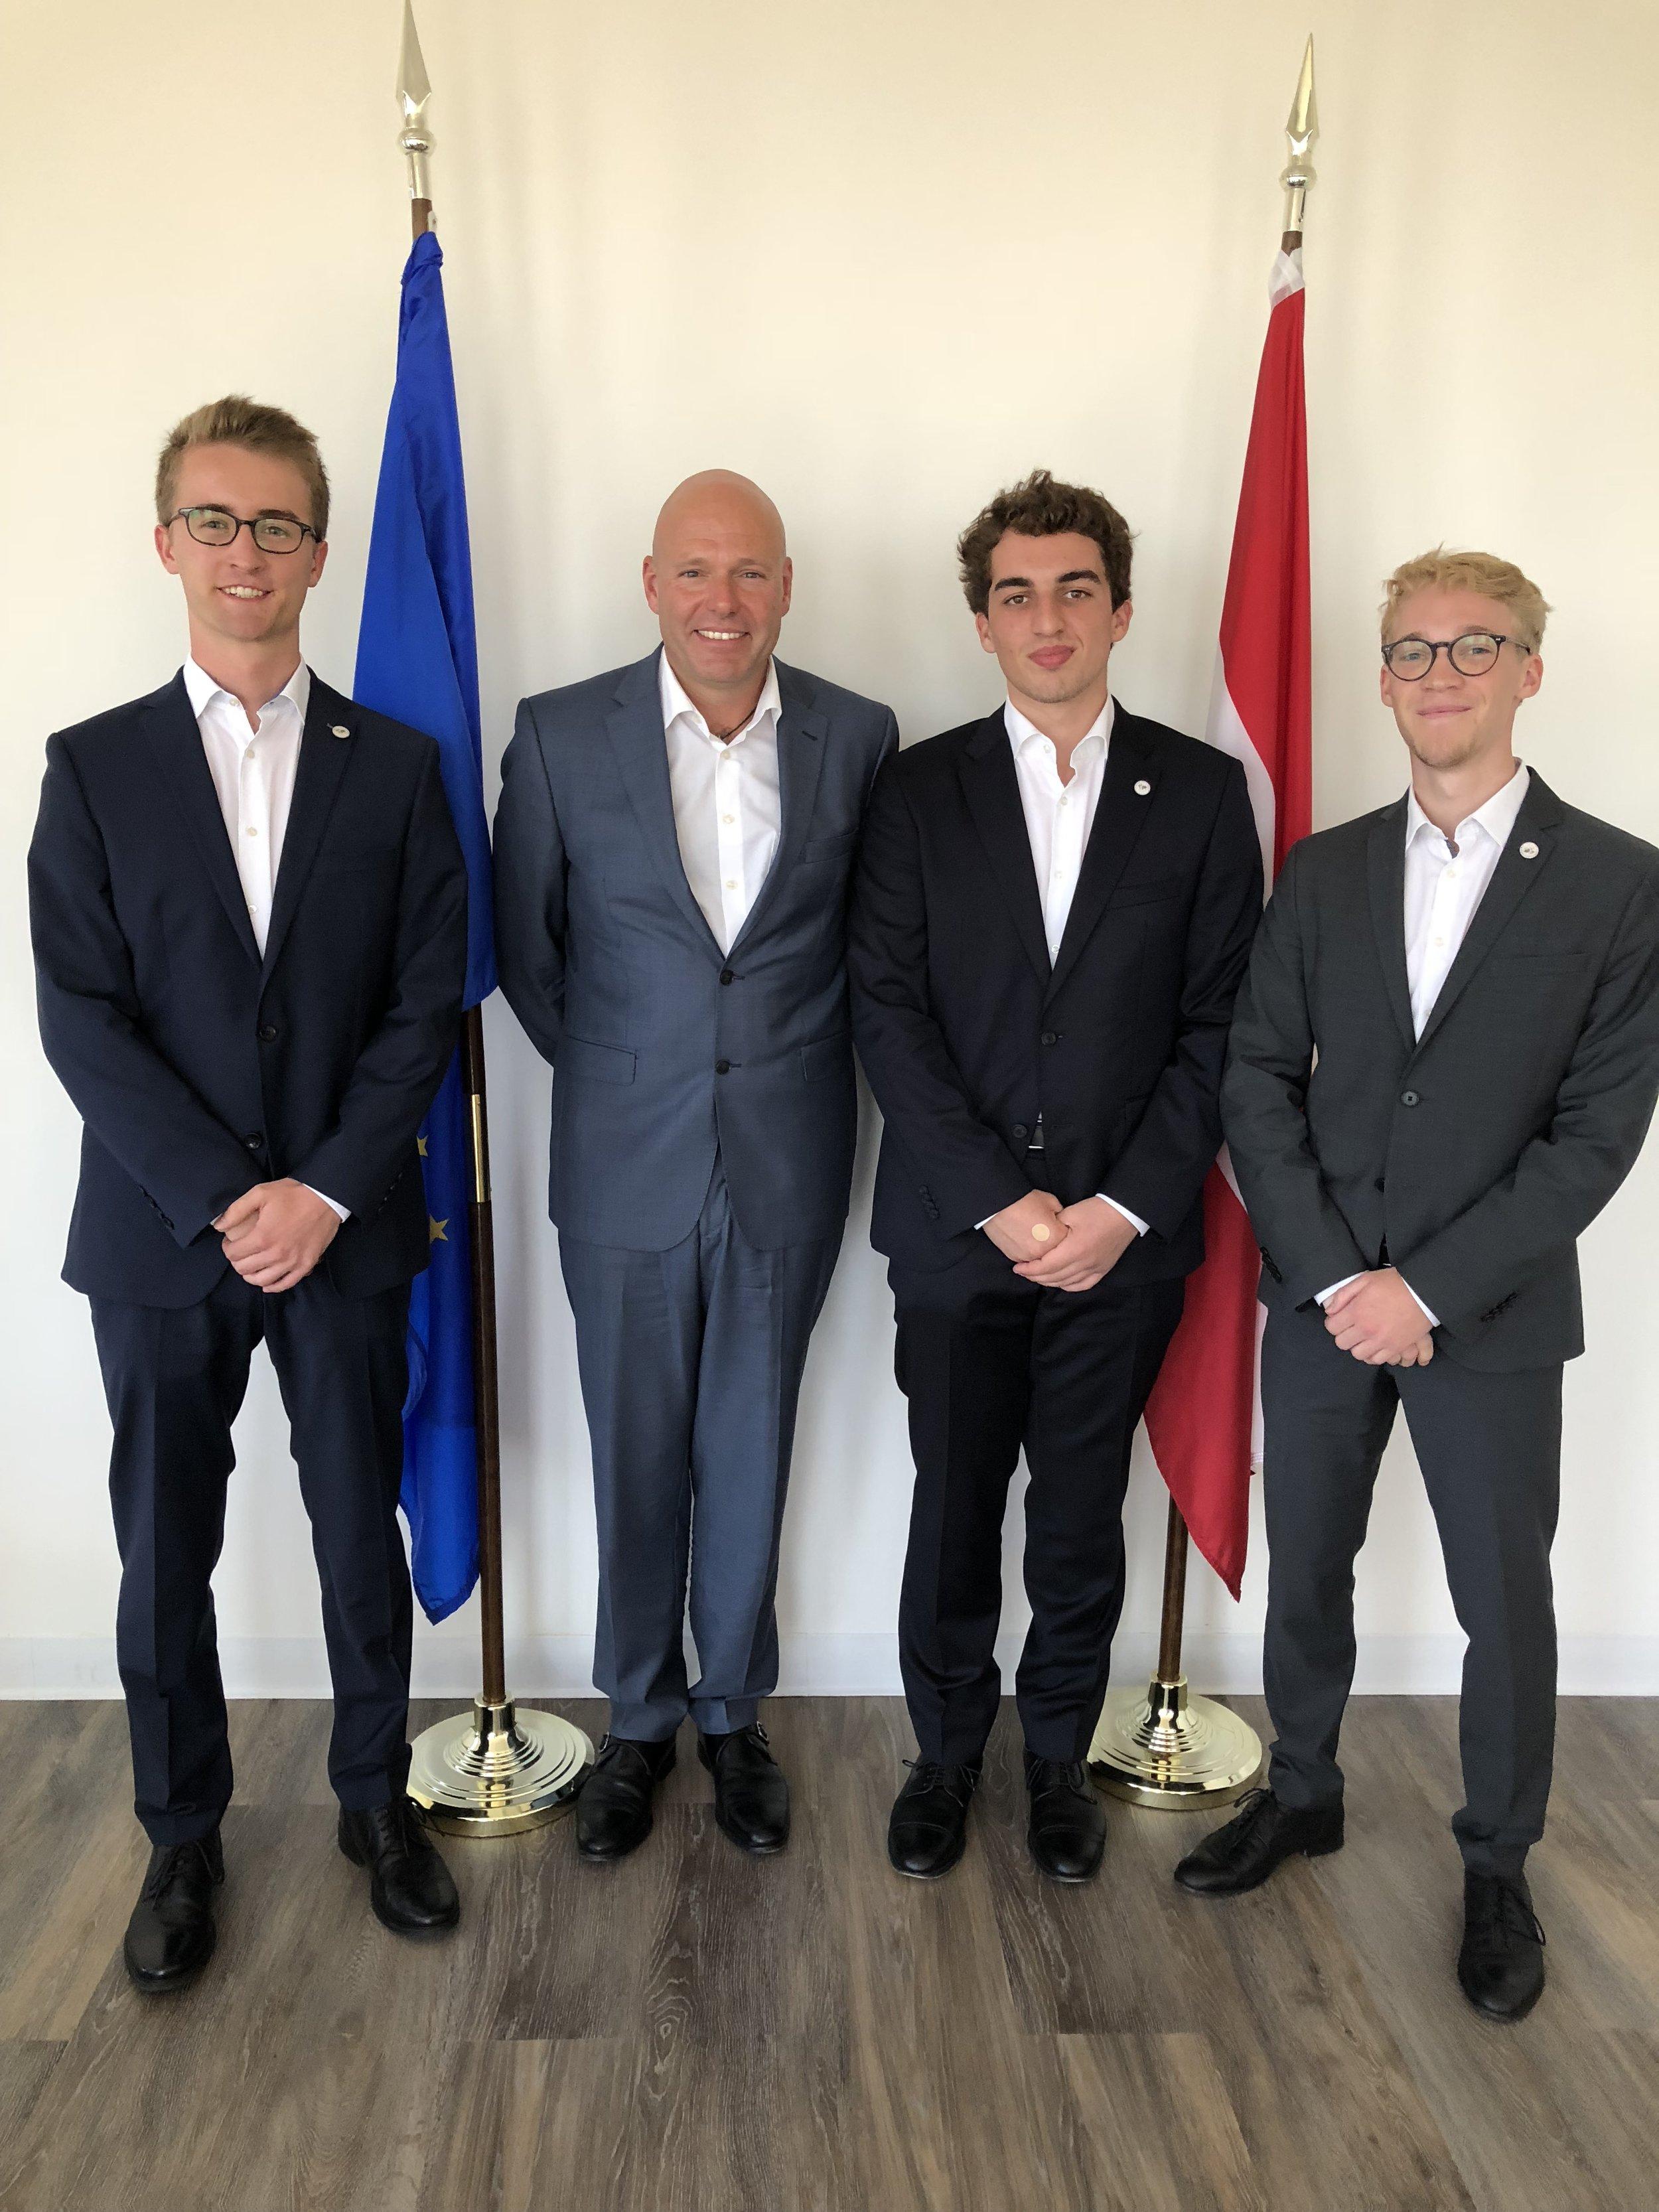 From left: Fabian Lahninger, Consul General Andreas Launer, Matteo Kramer, Paul Niemand